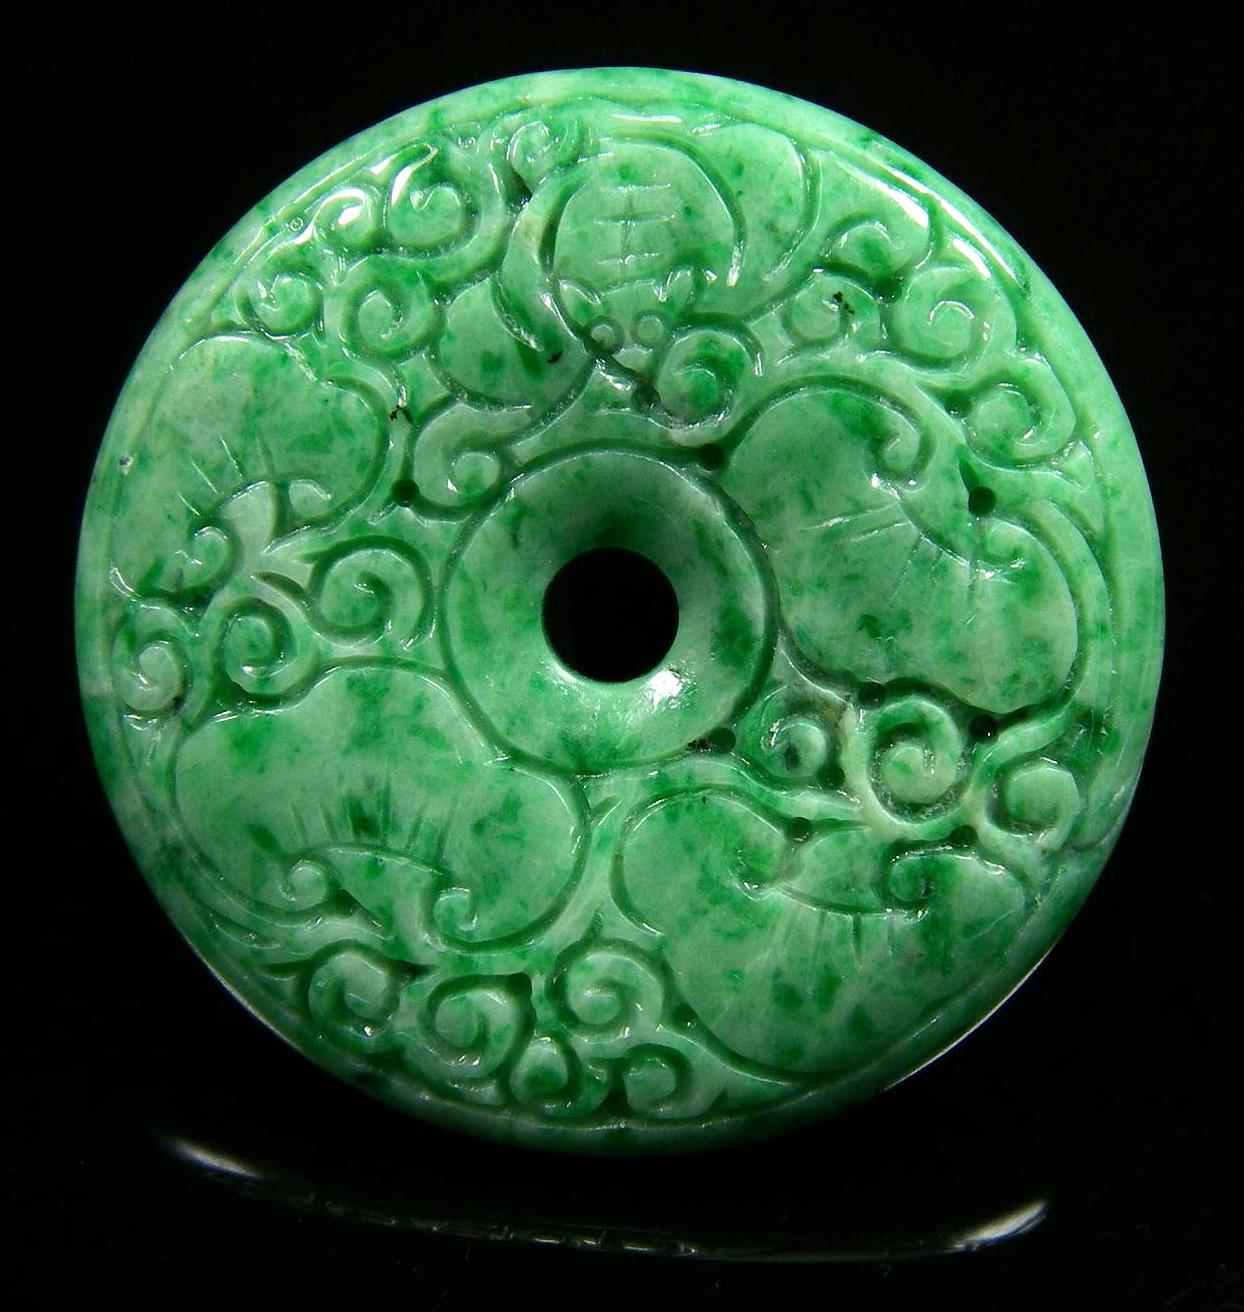 jade-button-naked-mature-women-in-essex